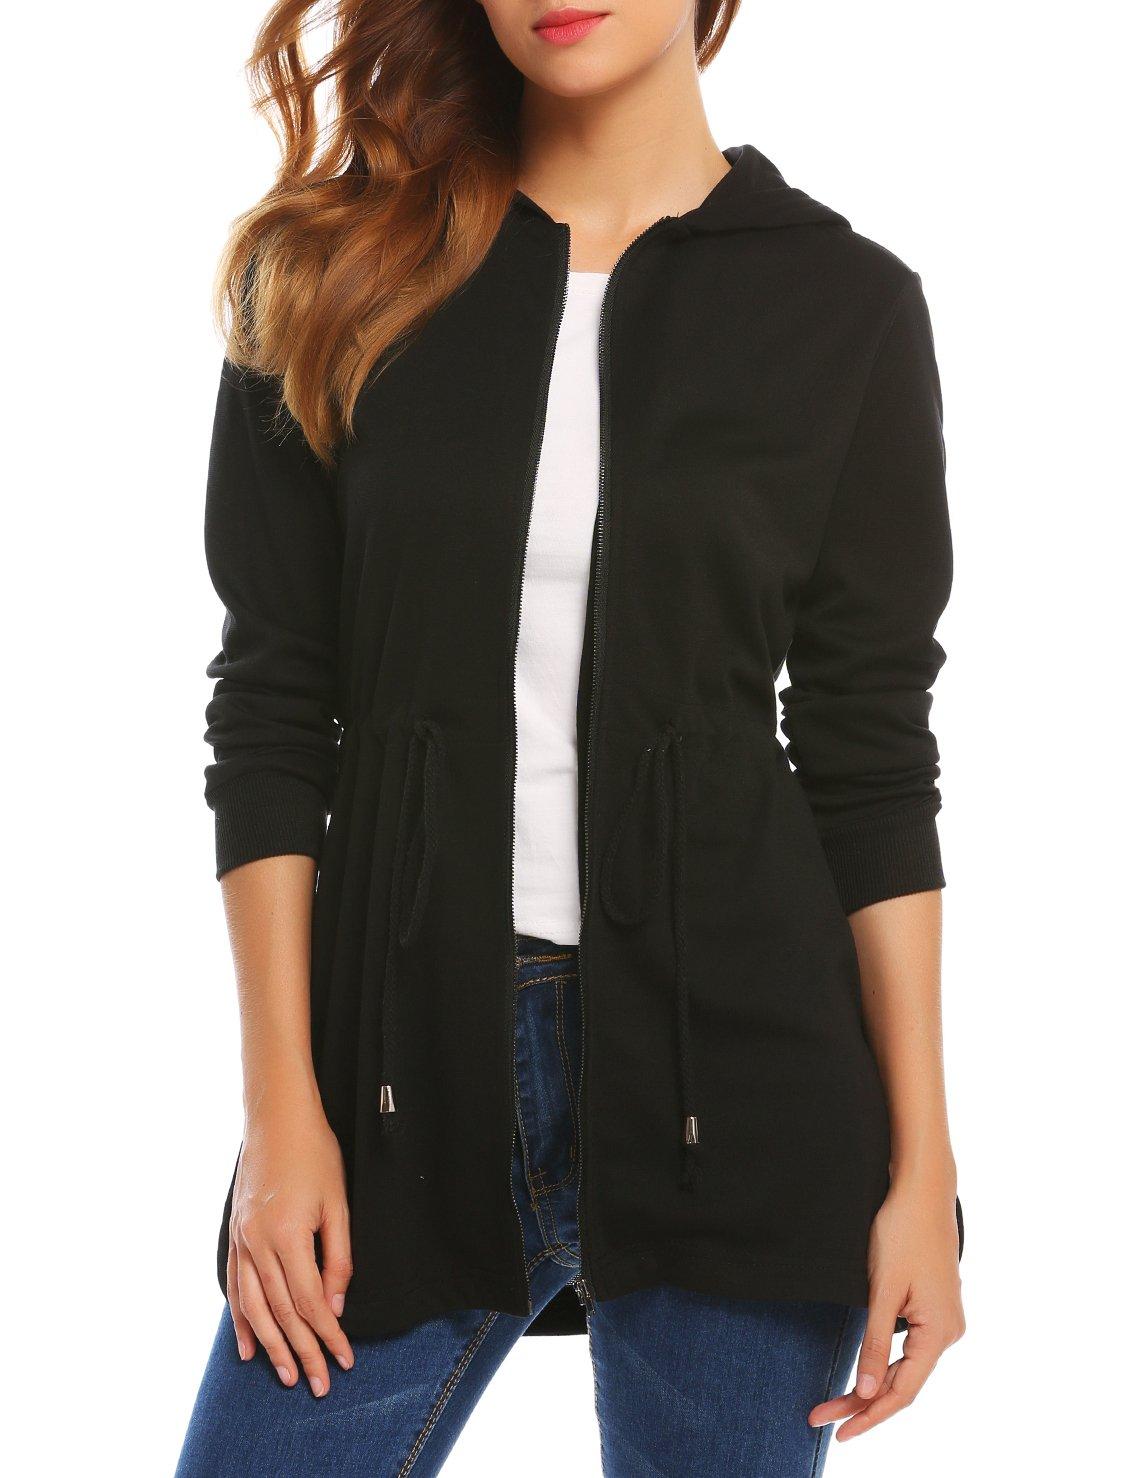 SE MIU Womens Active Soft Zip Up Hoodie Sweater Jacket Black S